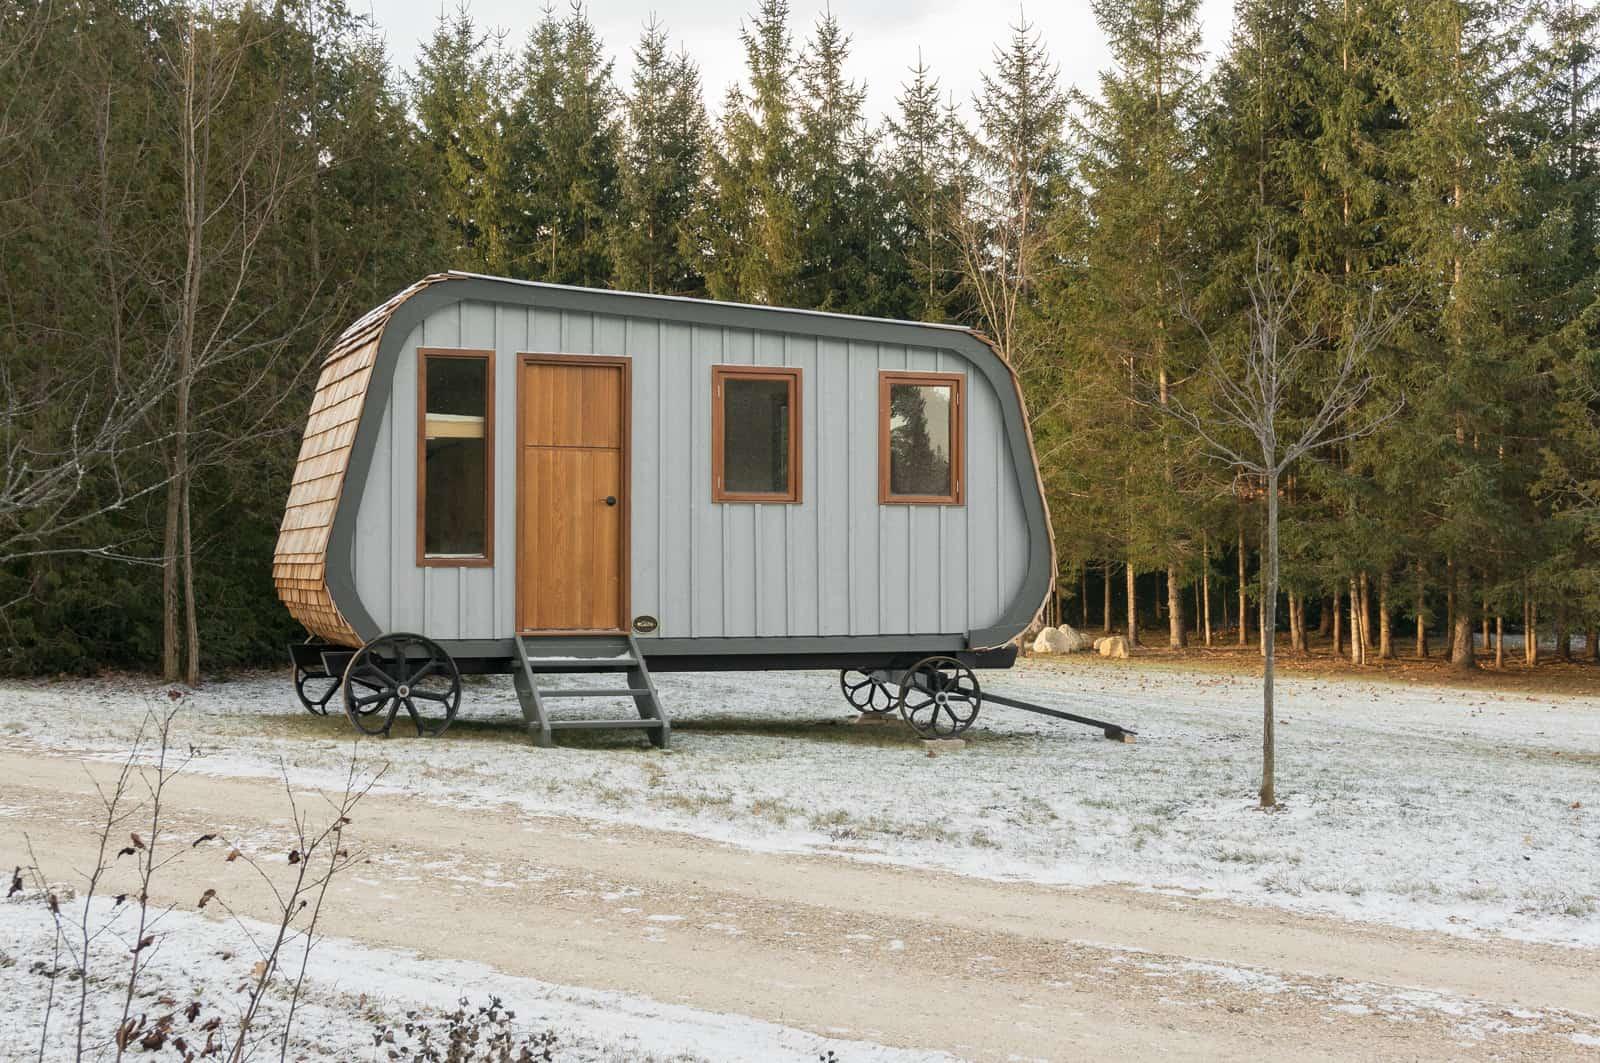 This Modern Prefab Hut on Wheels has all the Cabin Aesthetics